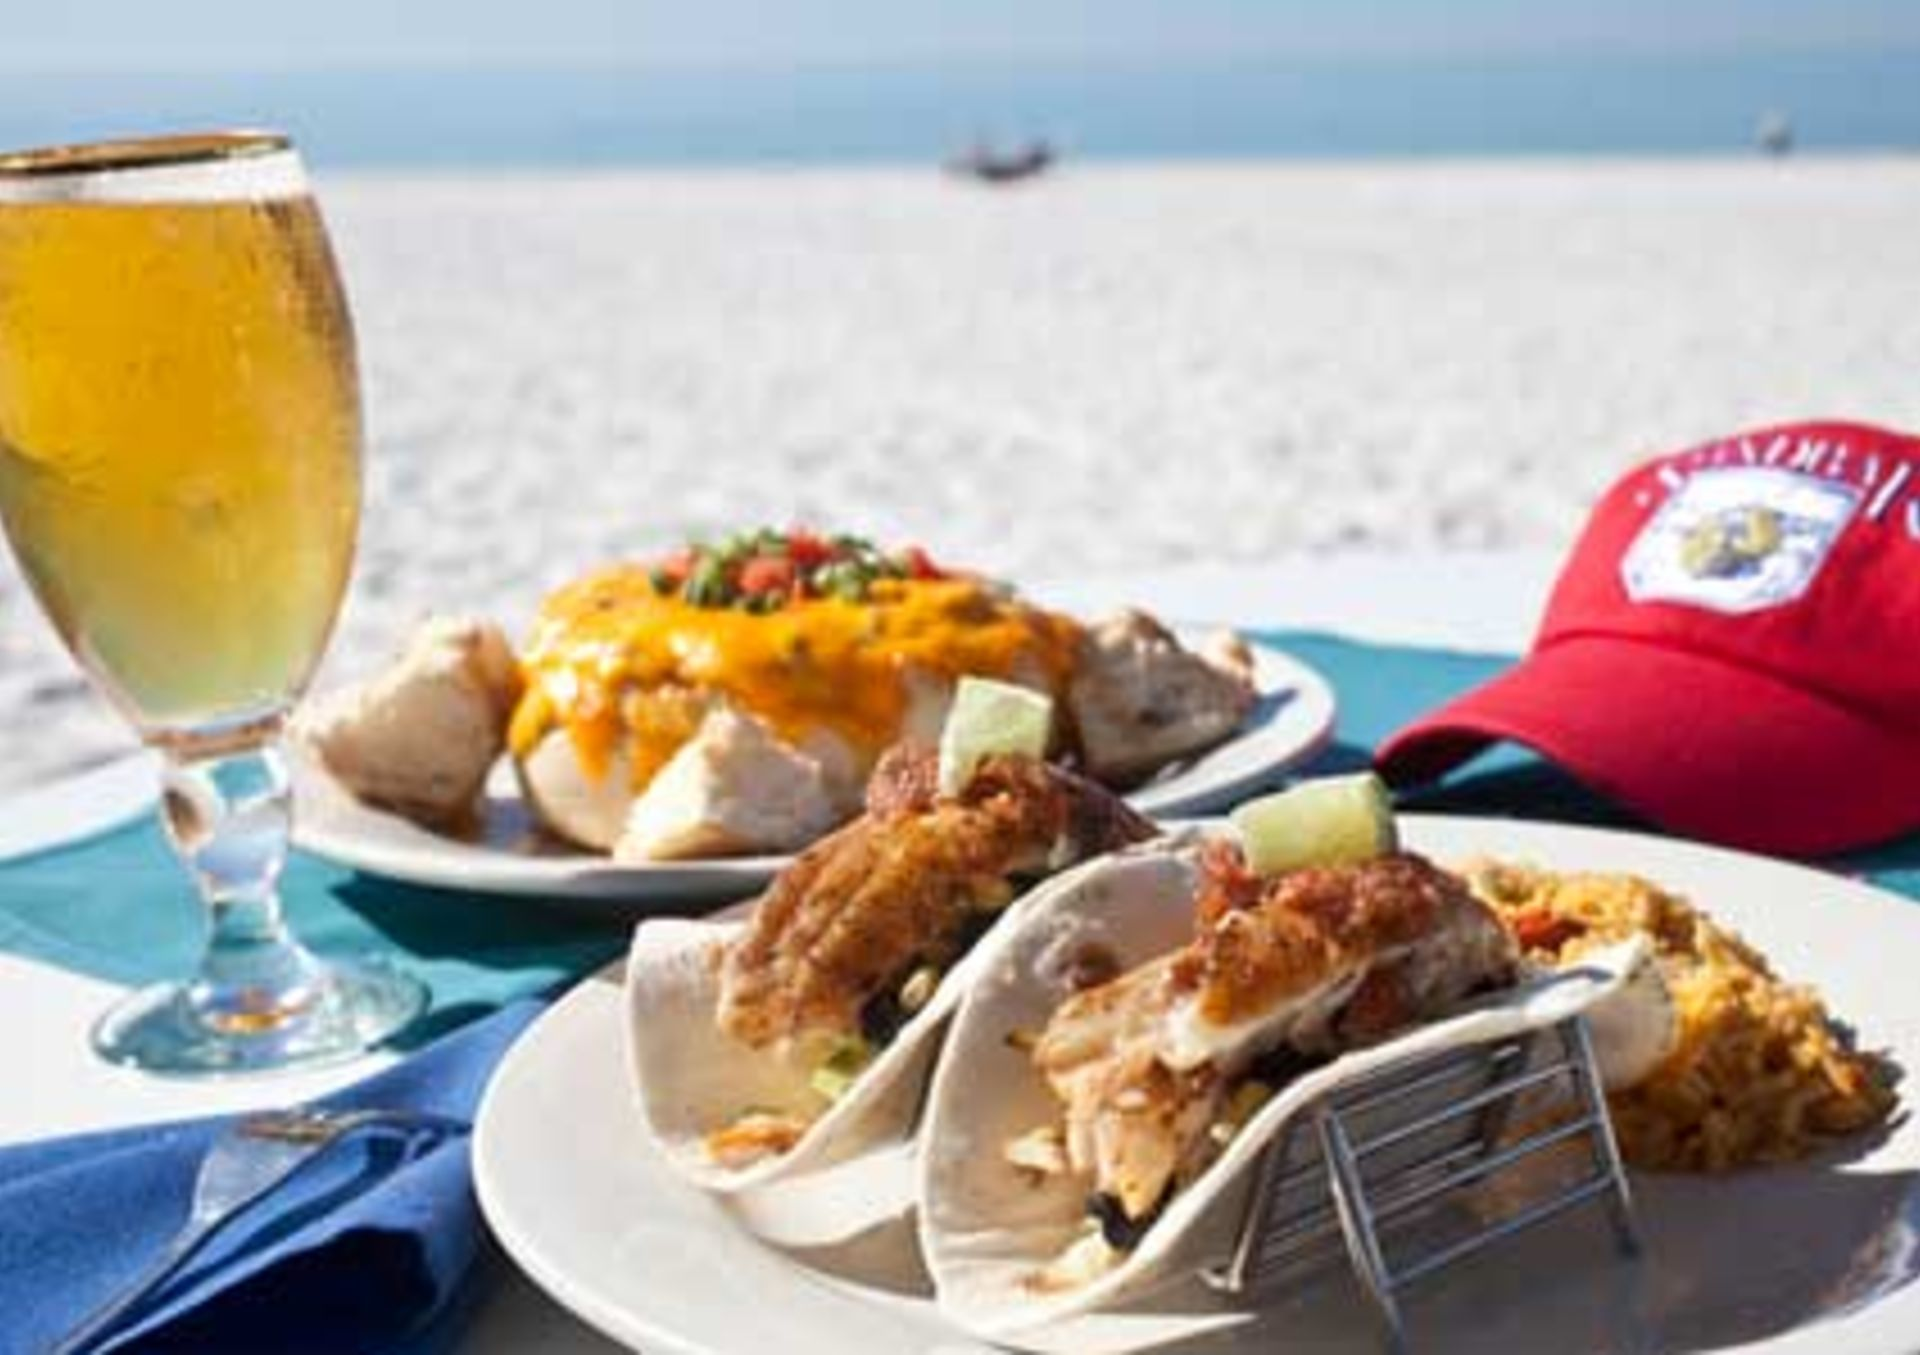 Save $10 at Three of Sarasota Bradenton's Landmark Restaurants